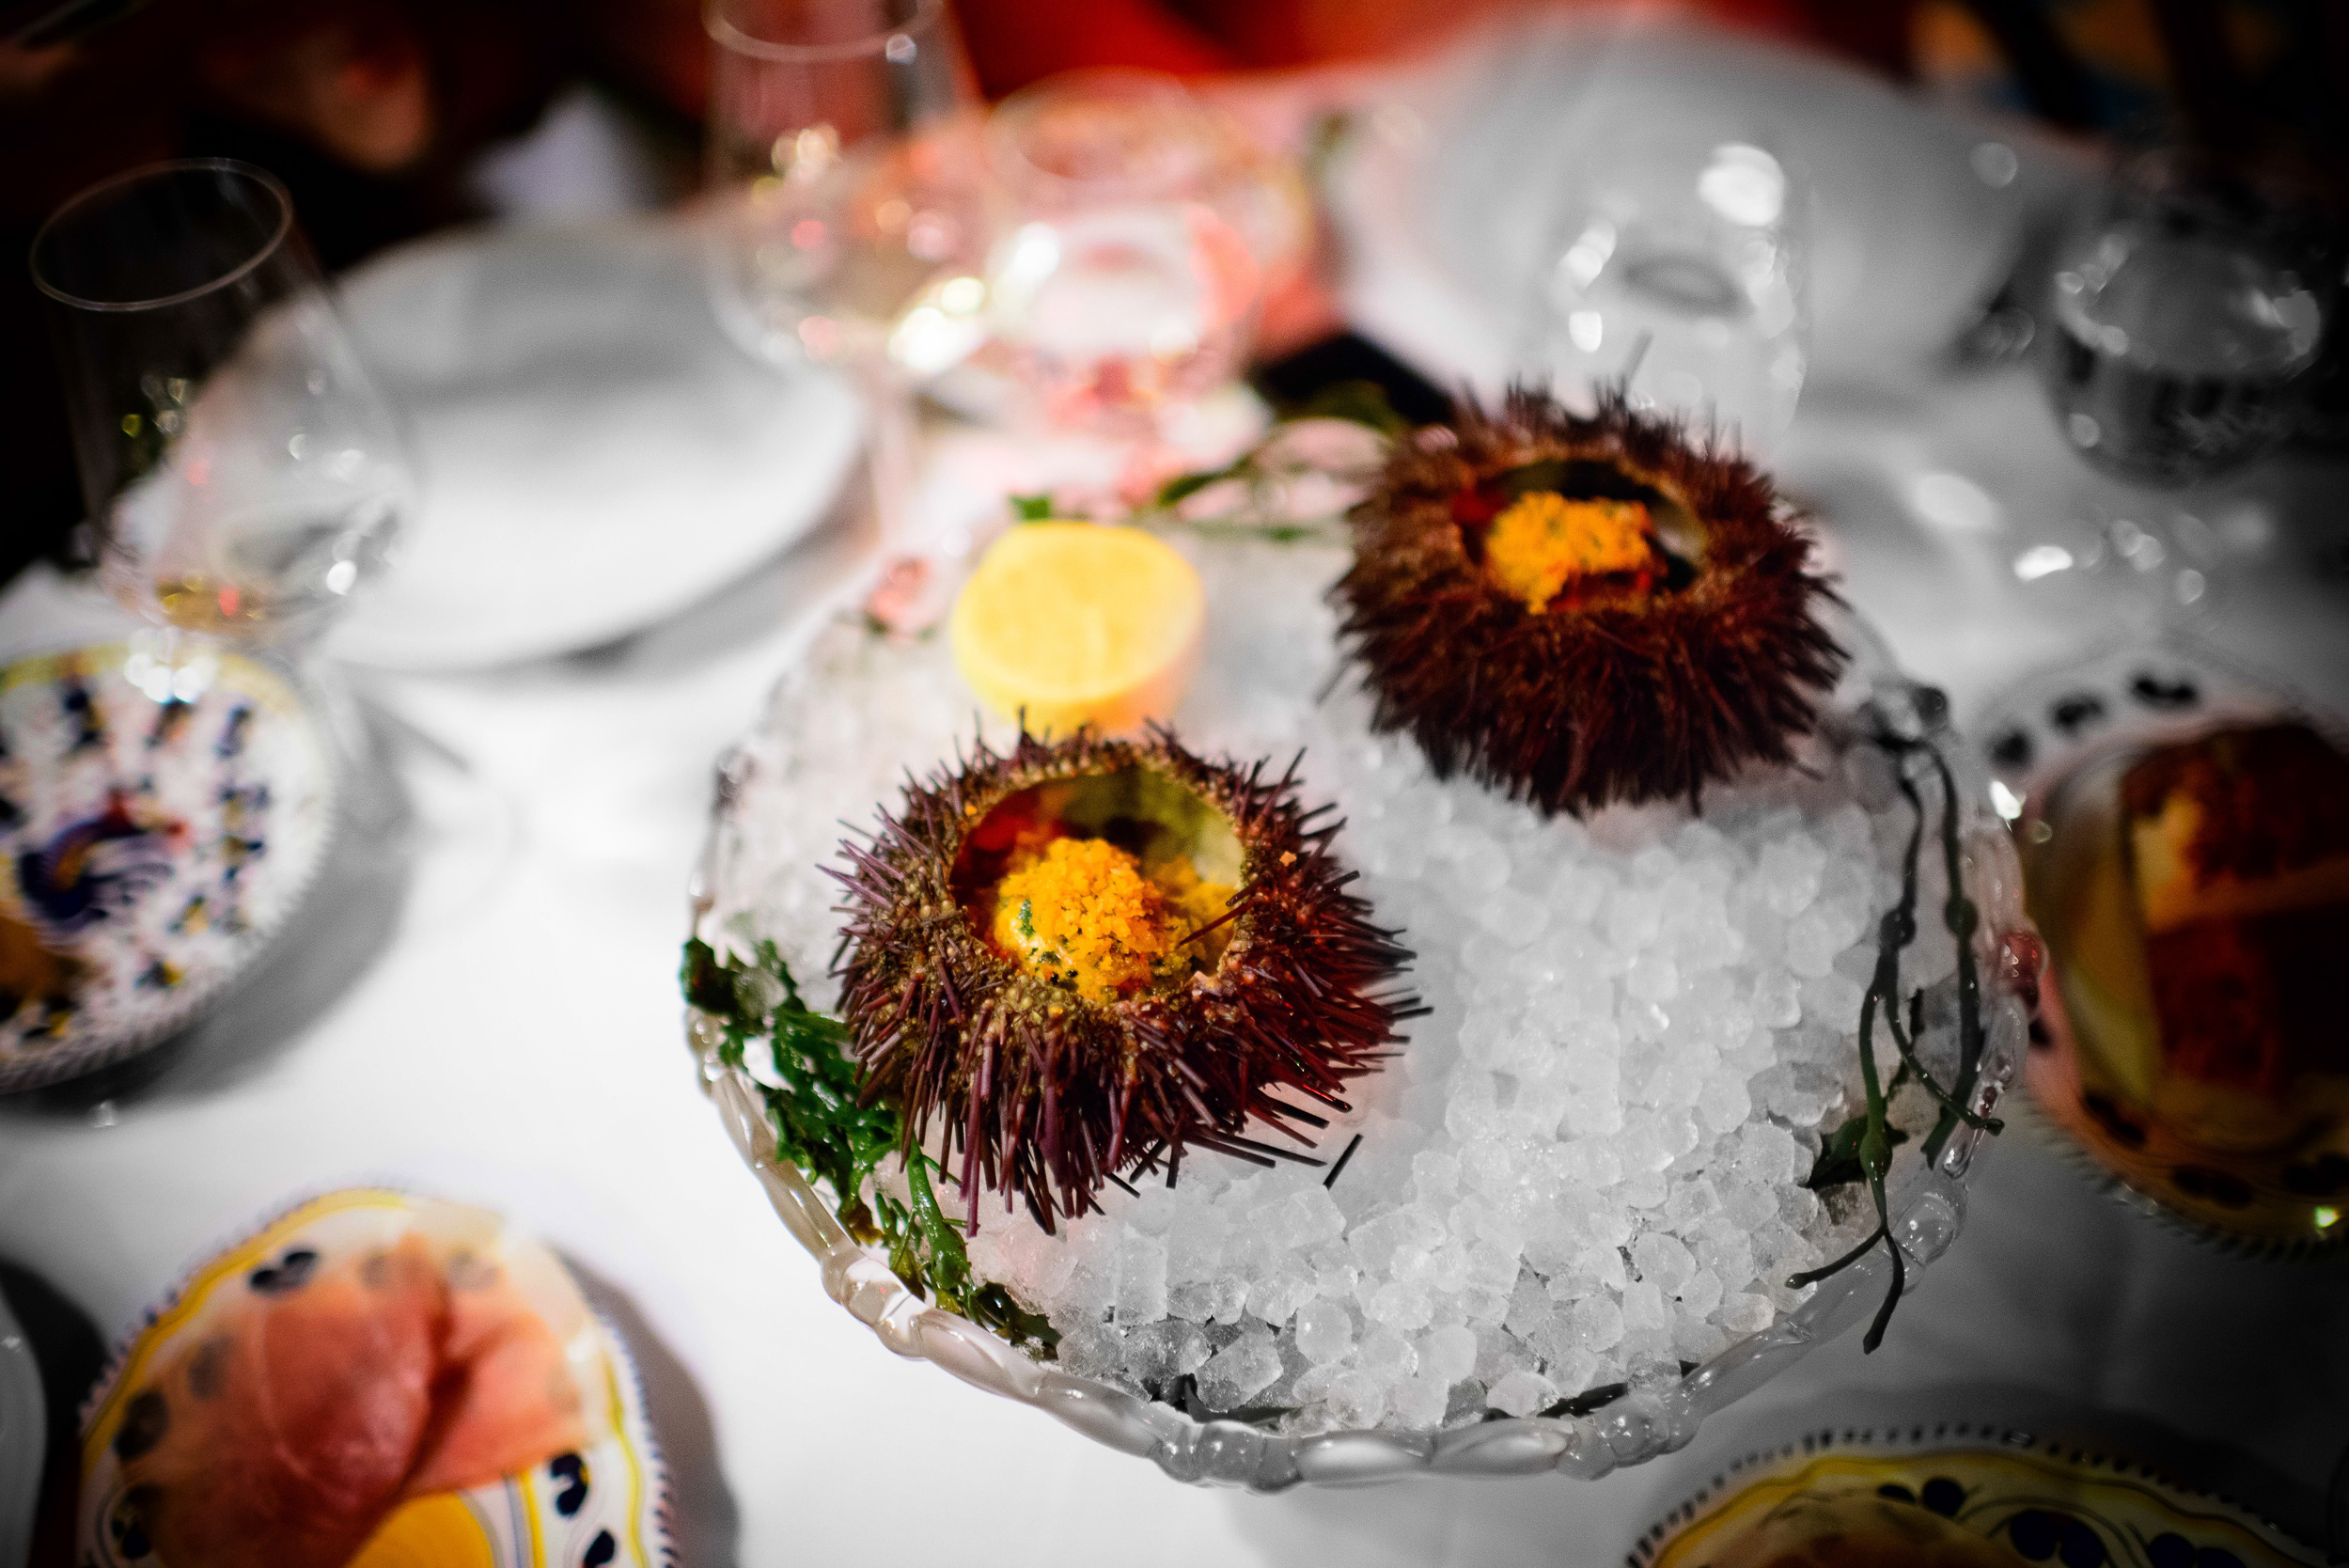 Sea urchin, spicy bread crumbs